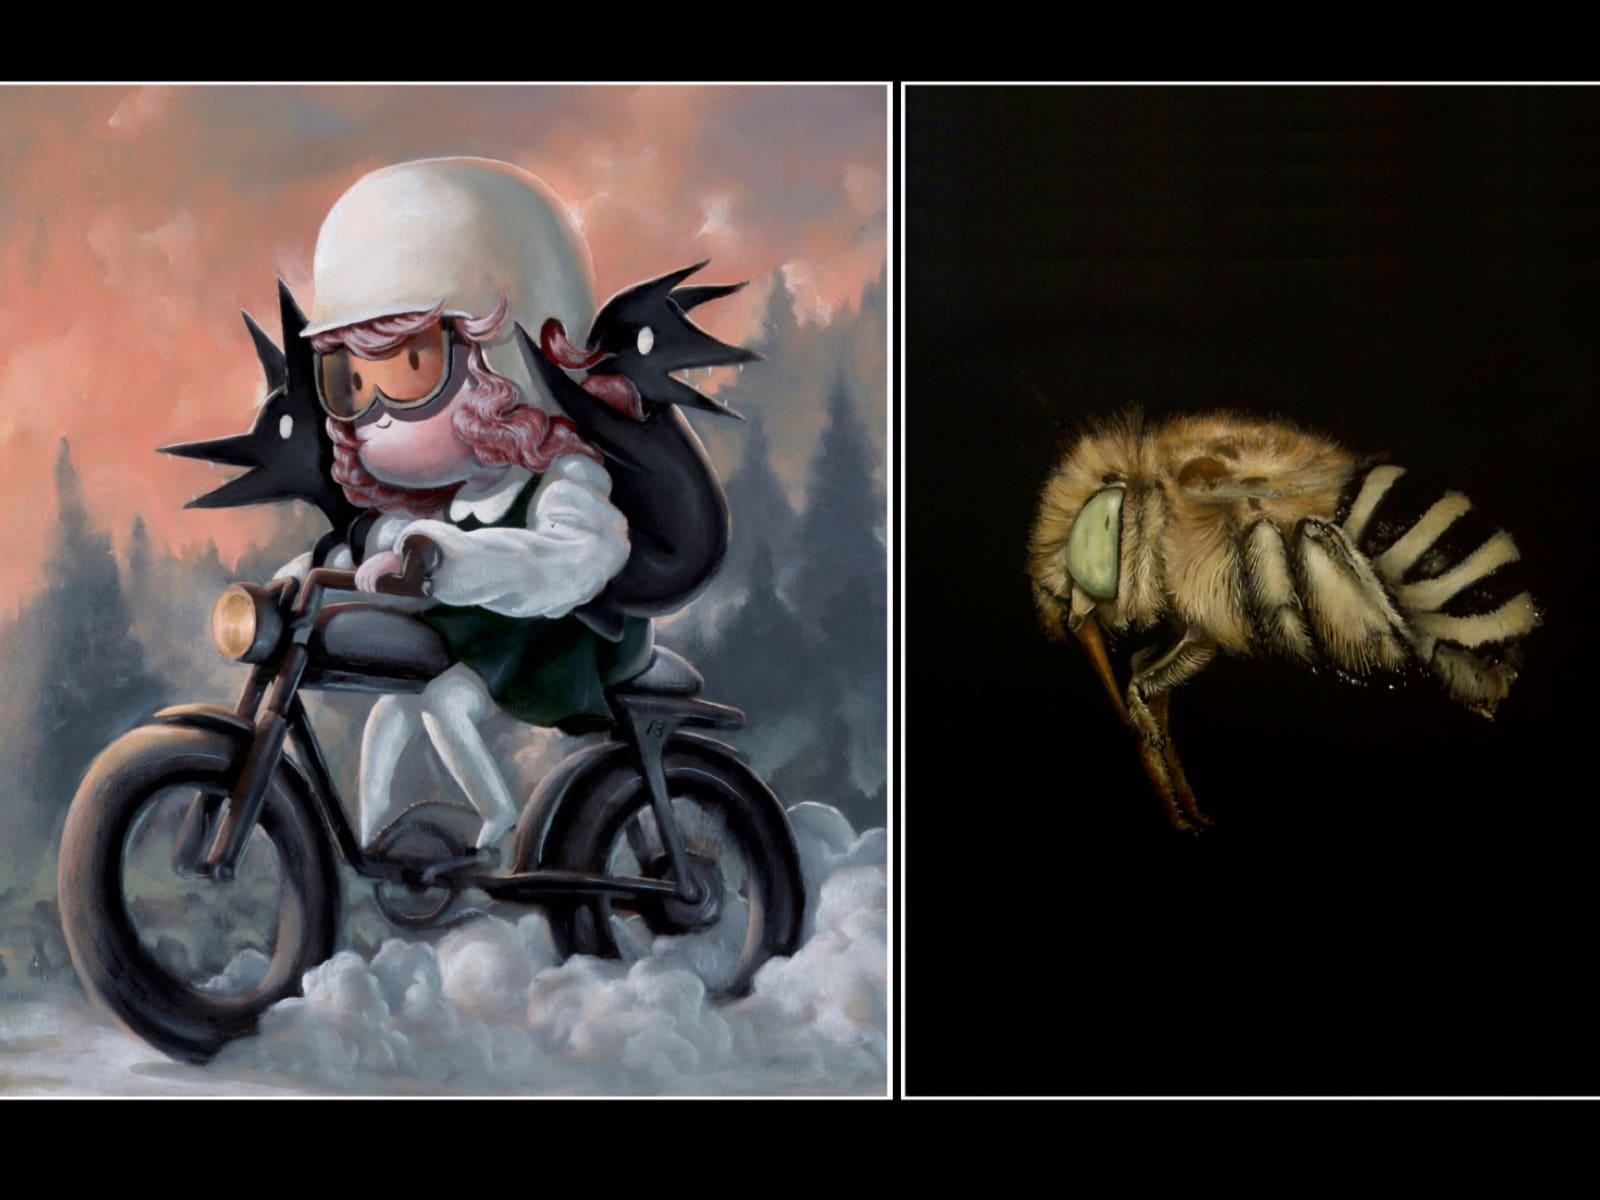 Two paintings, artist on left: Giorgiko; artist on right: Brad Woodfin